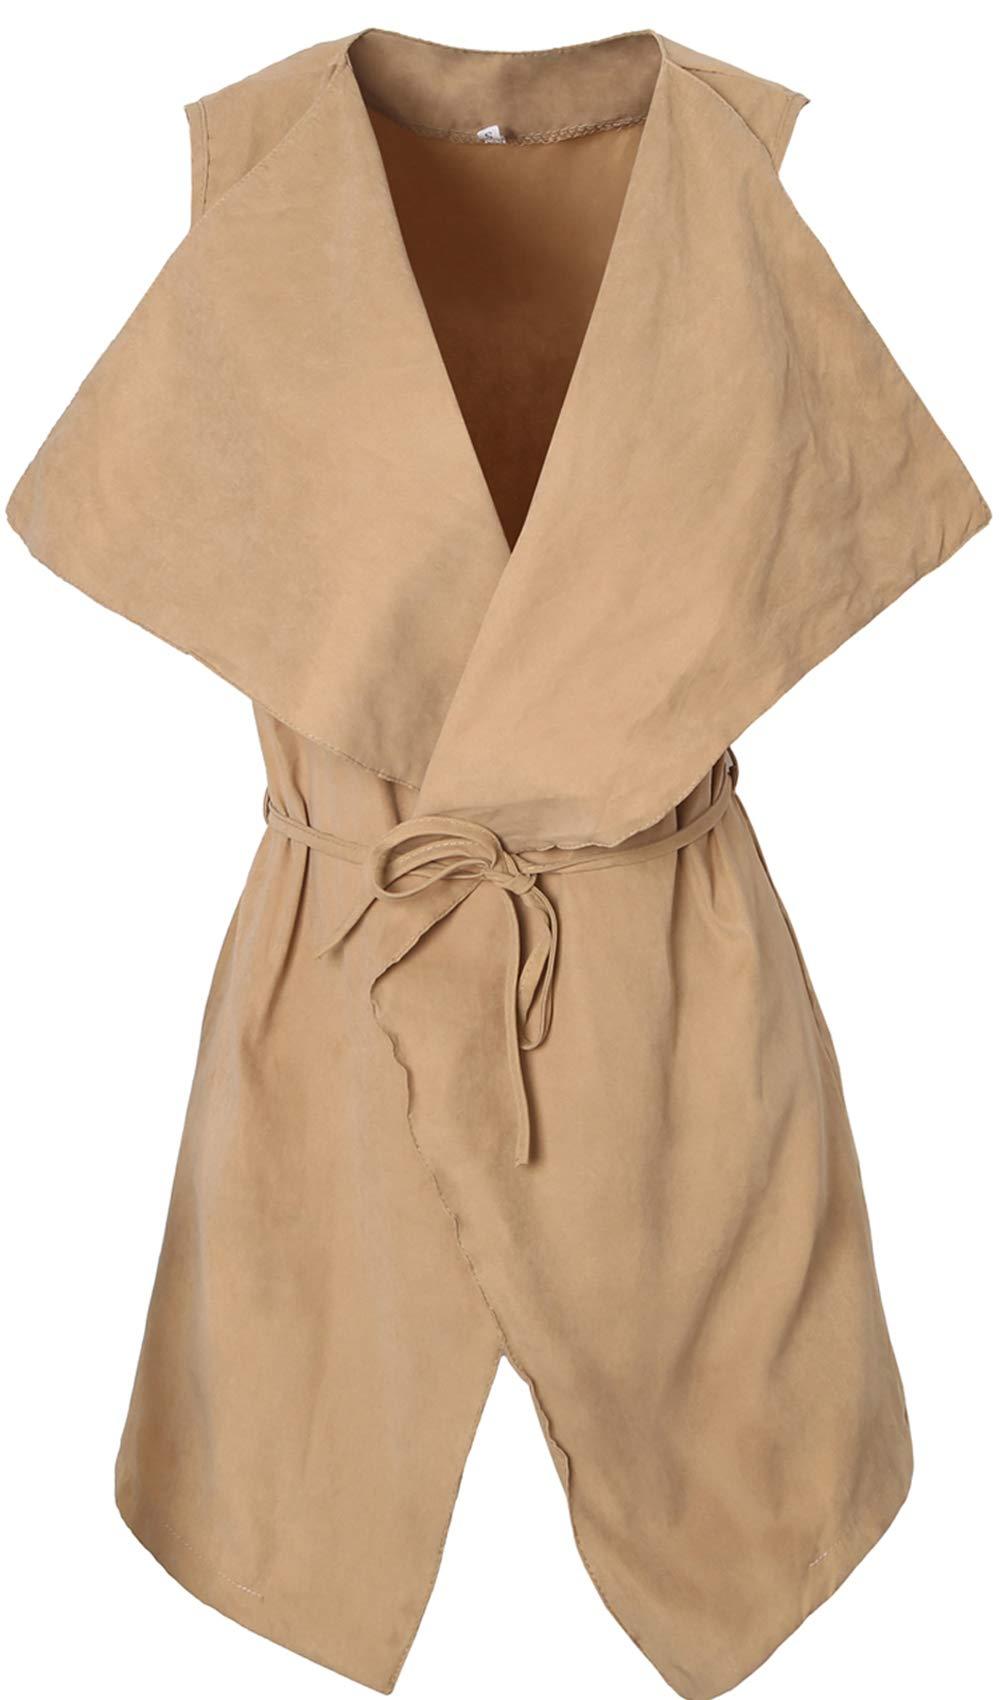 JOKHOO Women's Lapel Sleeveless Long Waistcoat Blazer Vest Cardigan with Belt Khaki